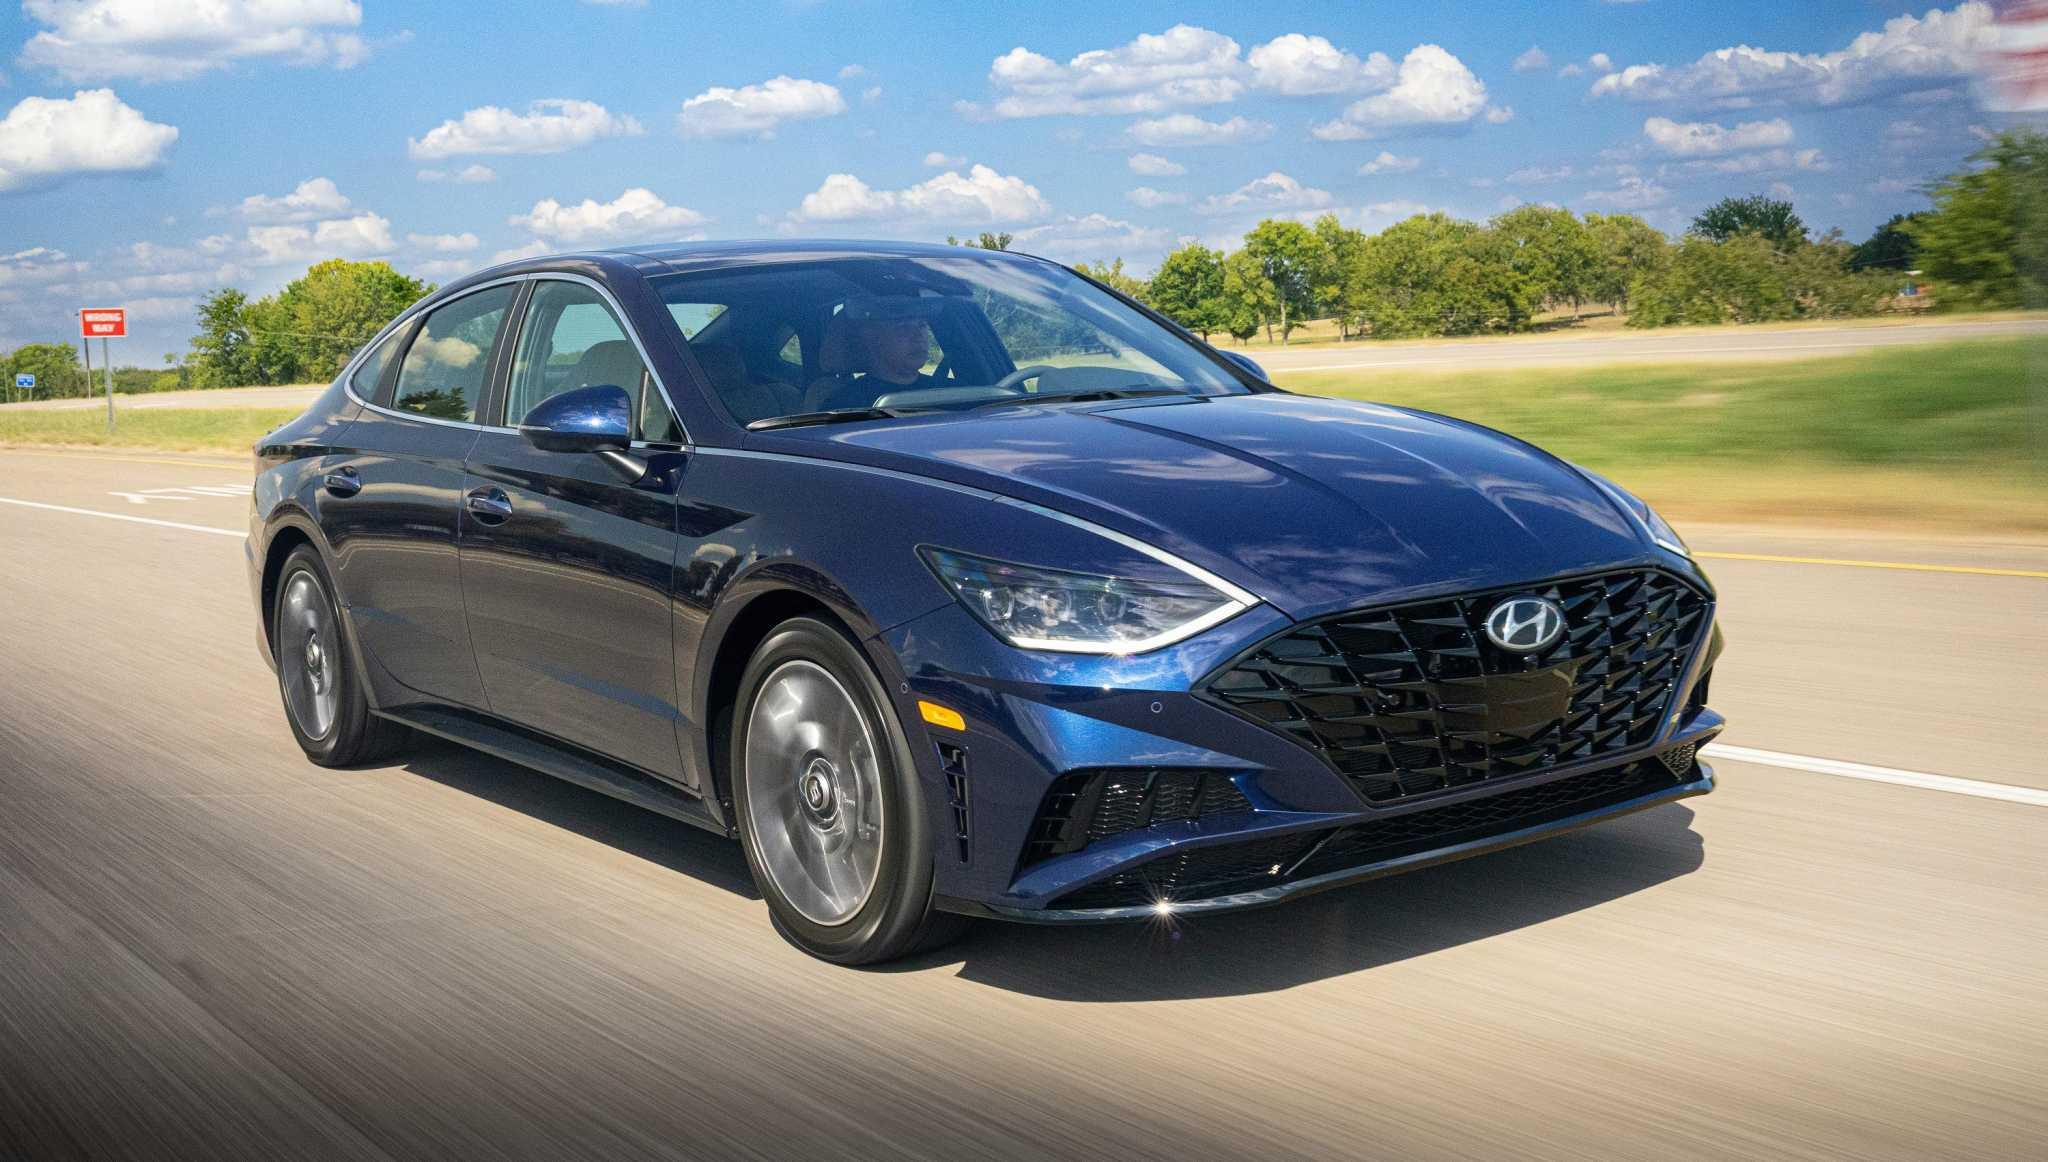 2020 Hyundai Sonata upgraded with a more striking design, new body architecture